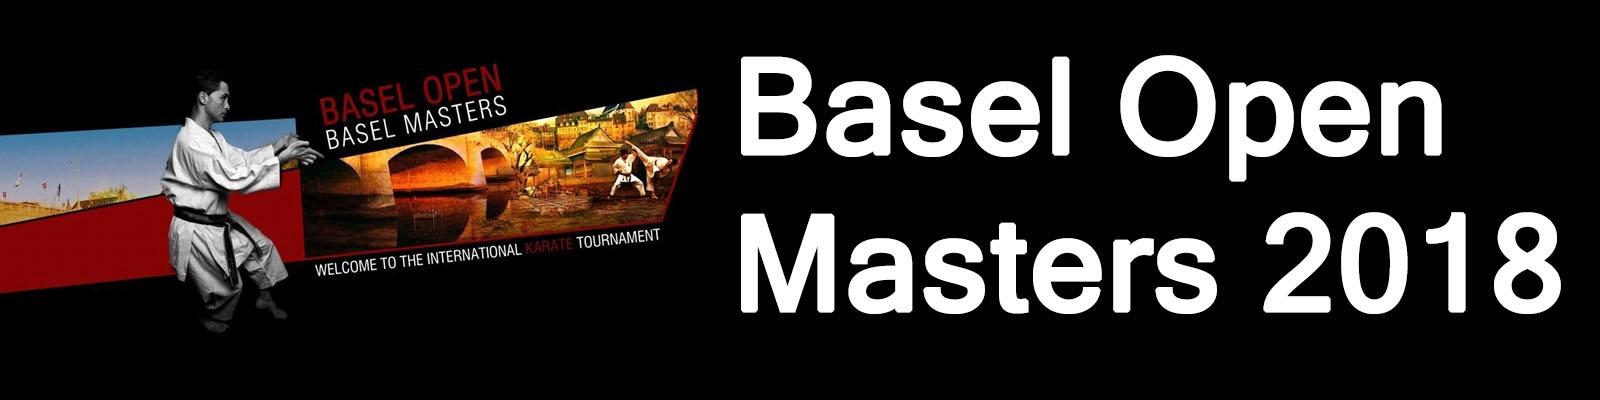 set online sskf  9  international basel open masters 2018